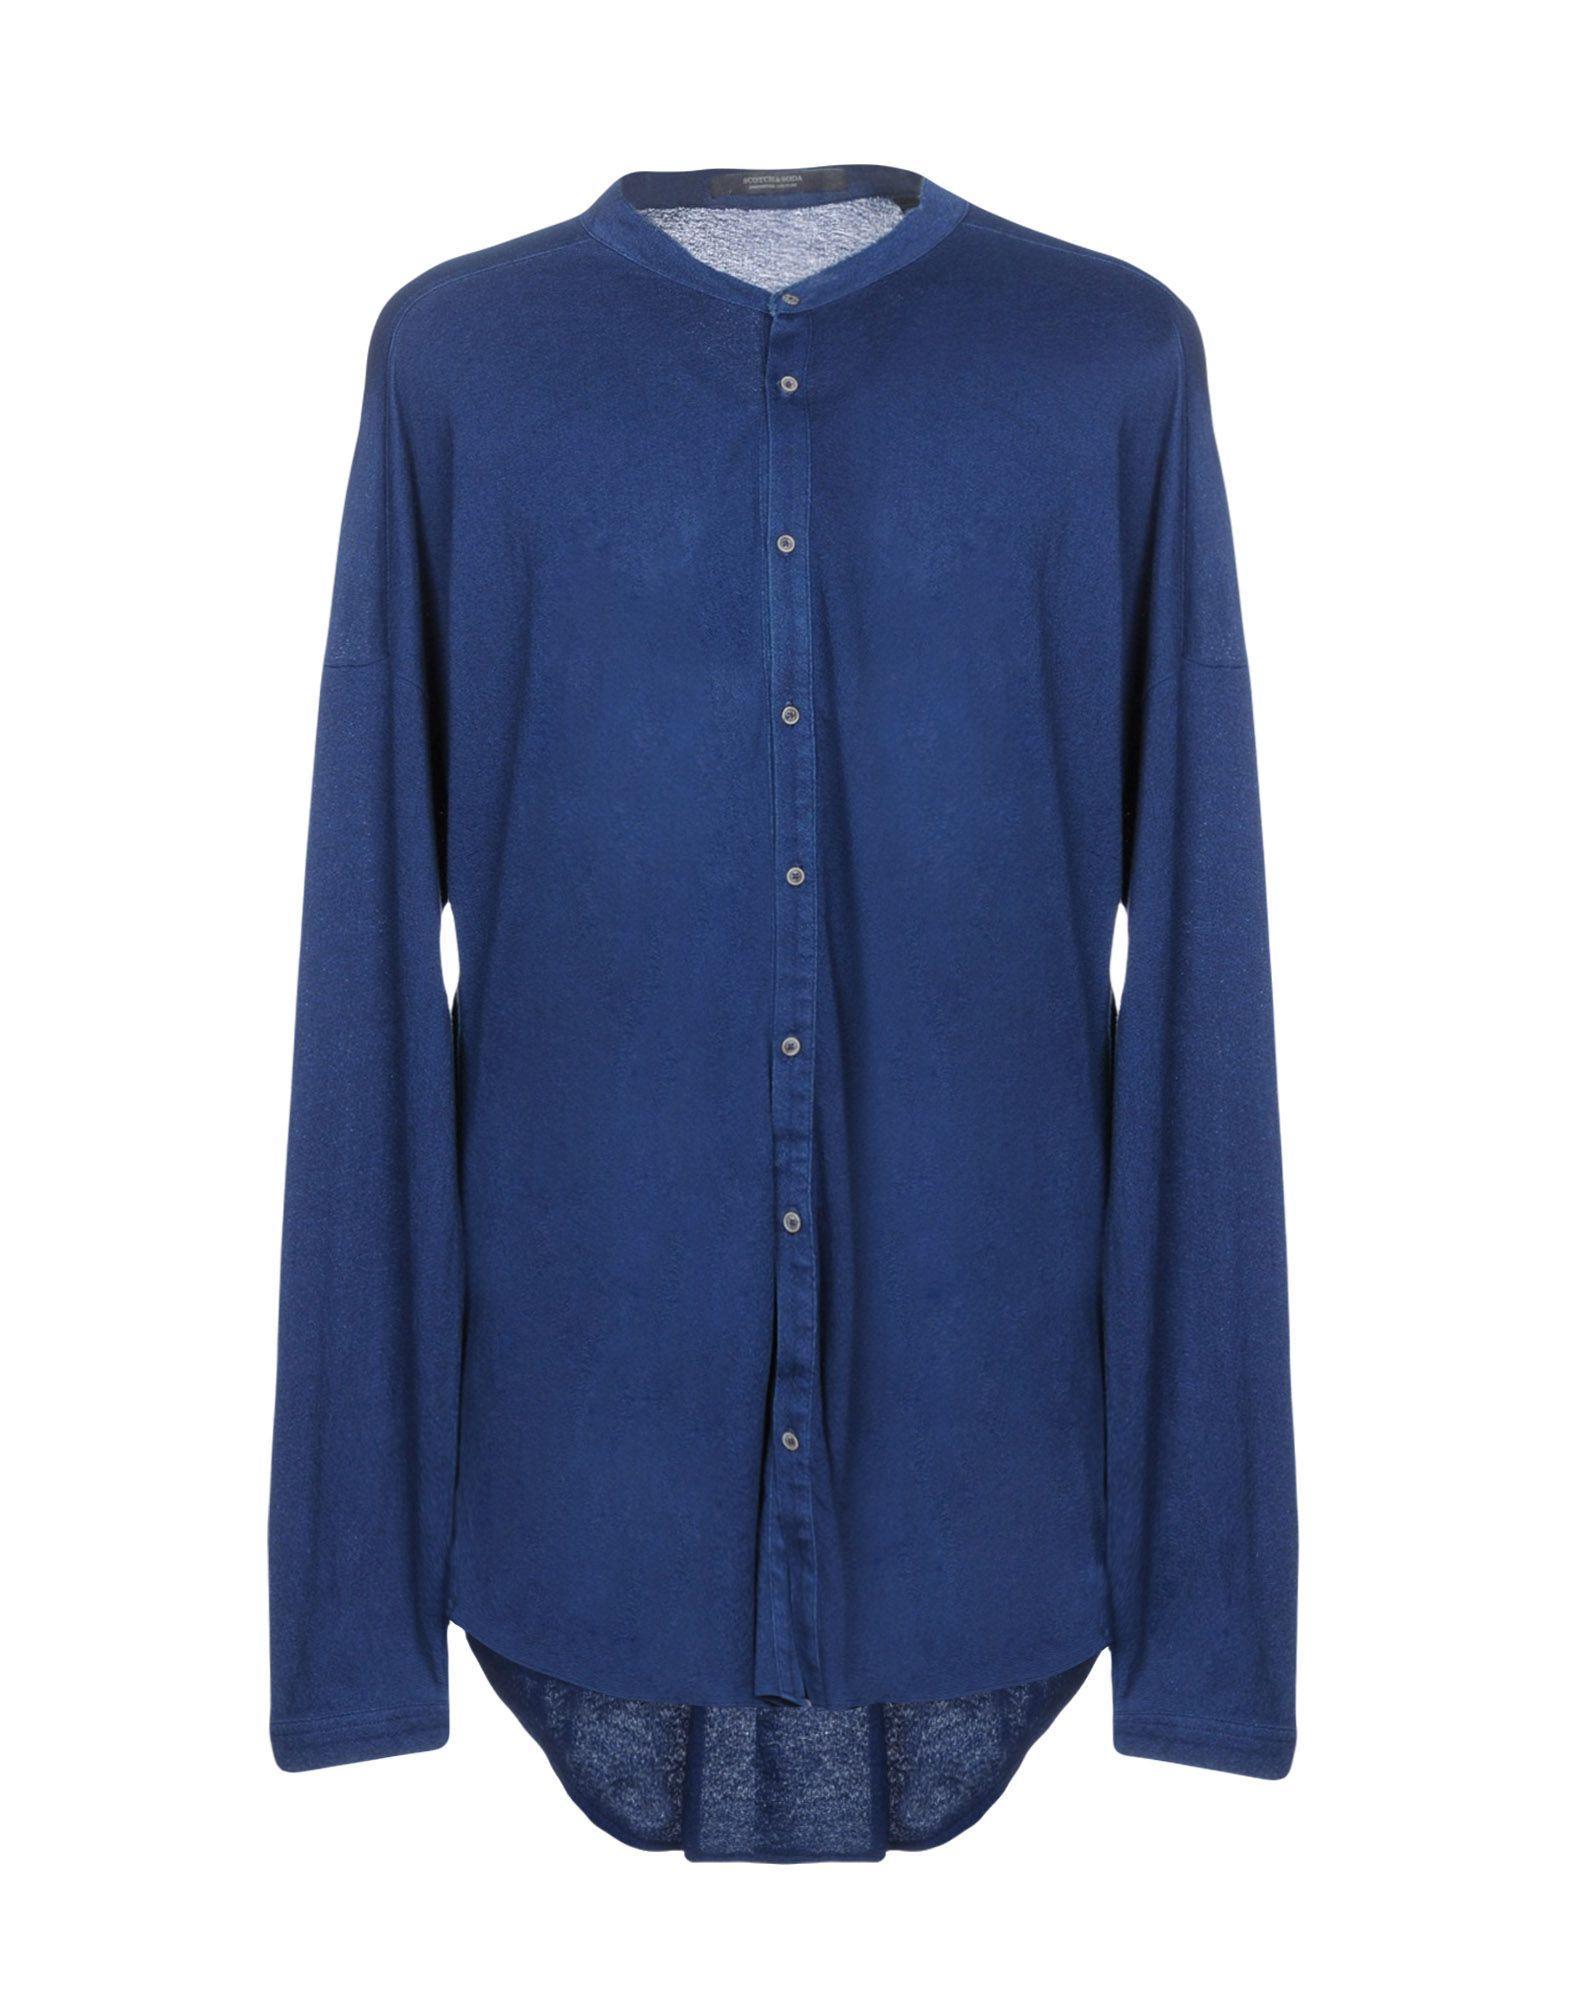 Scotch & Soda Solid Color Shirt In Dark Blue